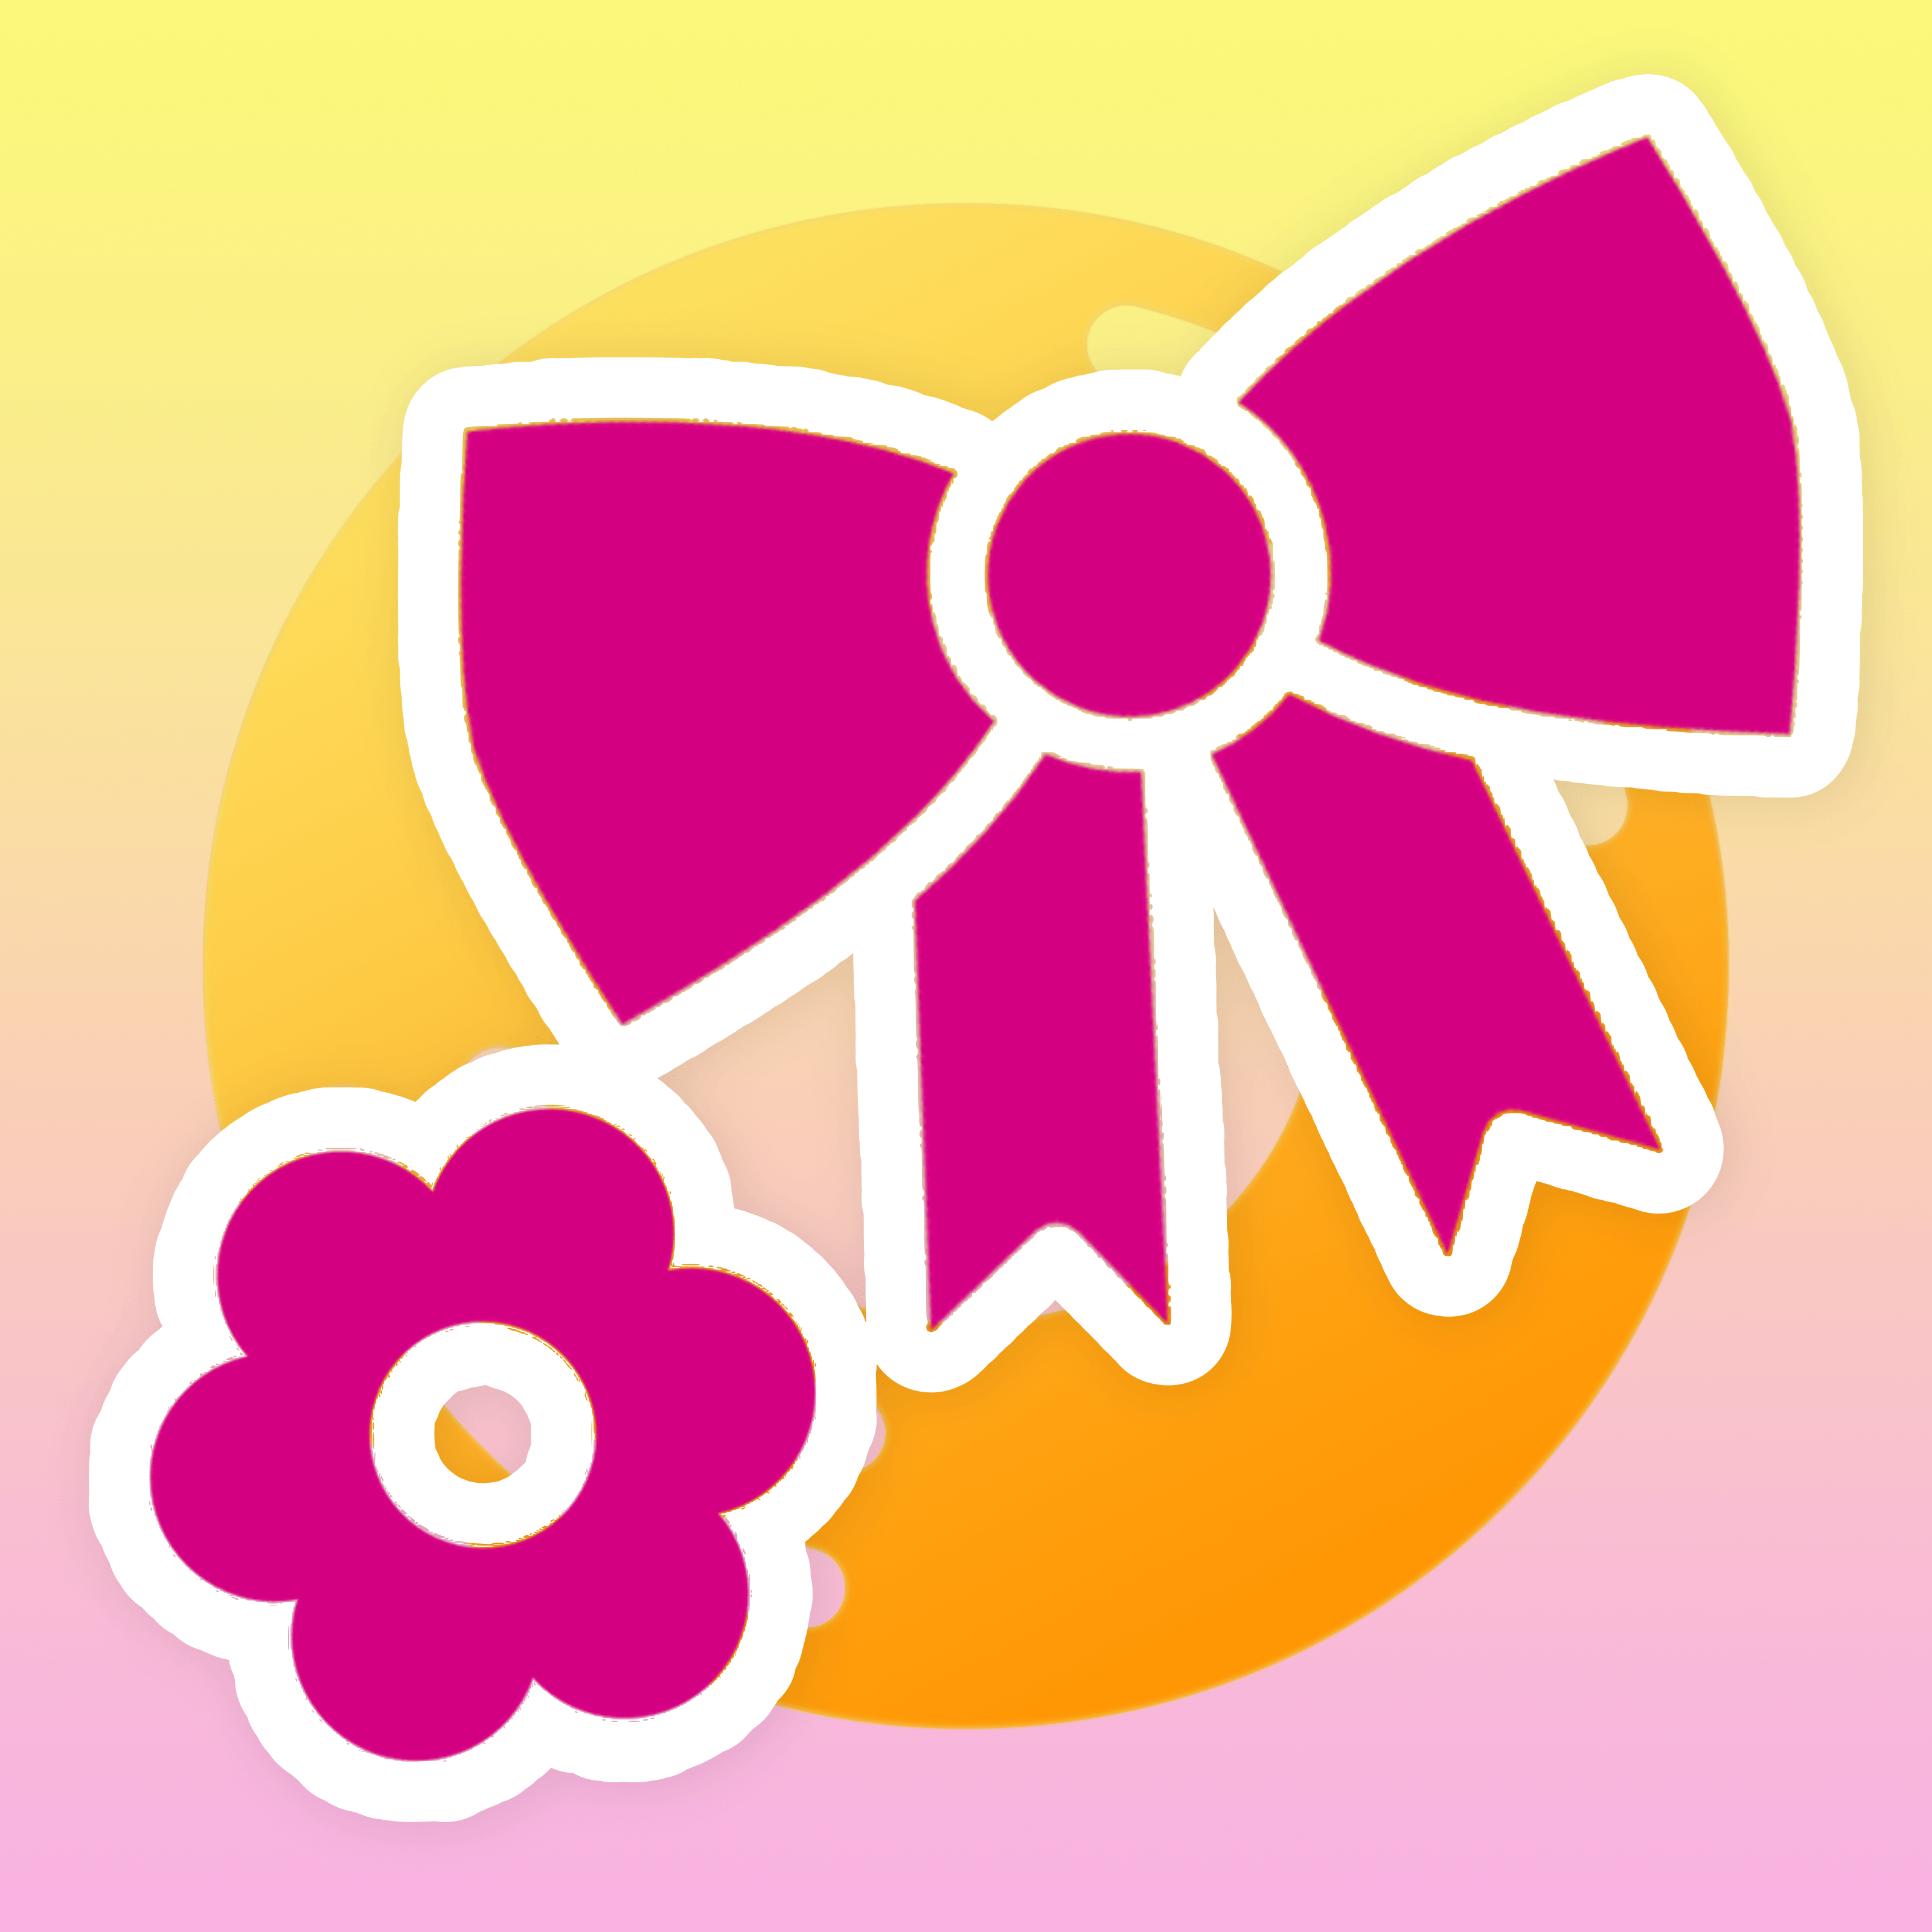 ohayohaneee._.7.13 avatar